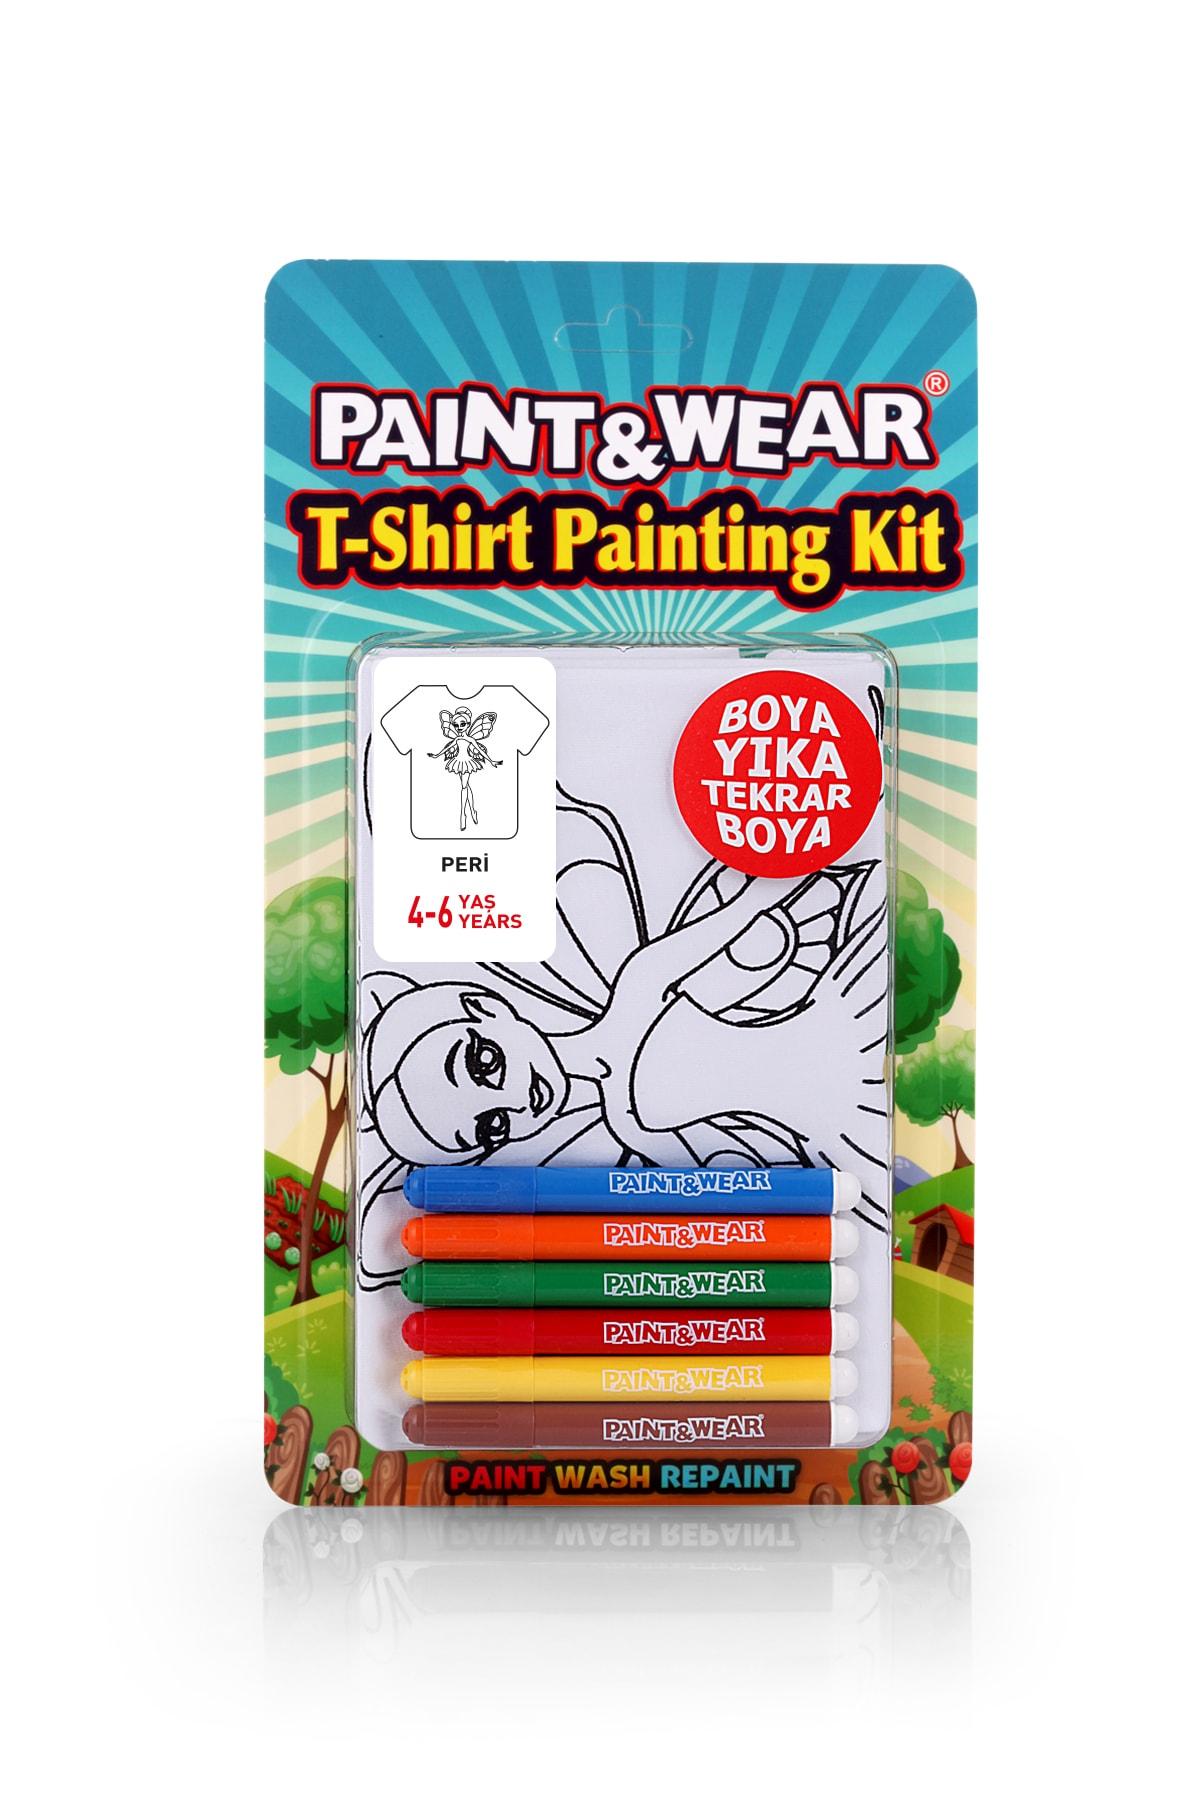 paint-wear Peri Boyama T-shirt 4-6 Yaş 1